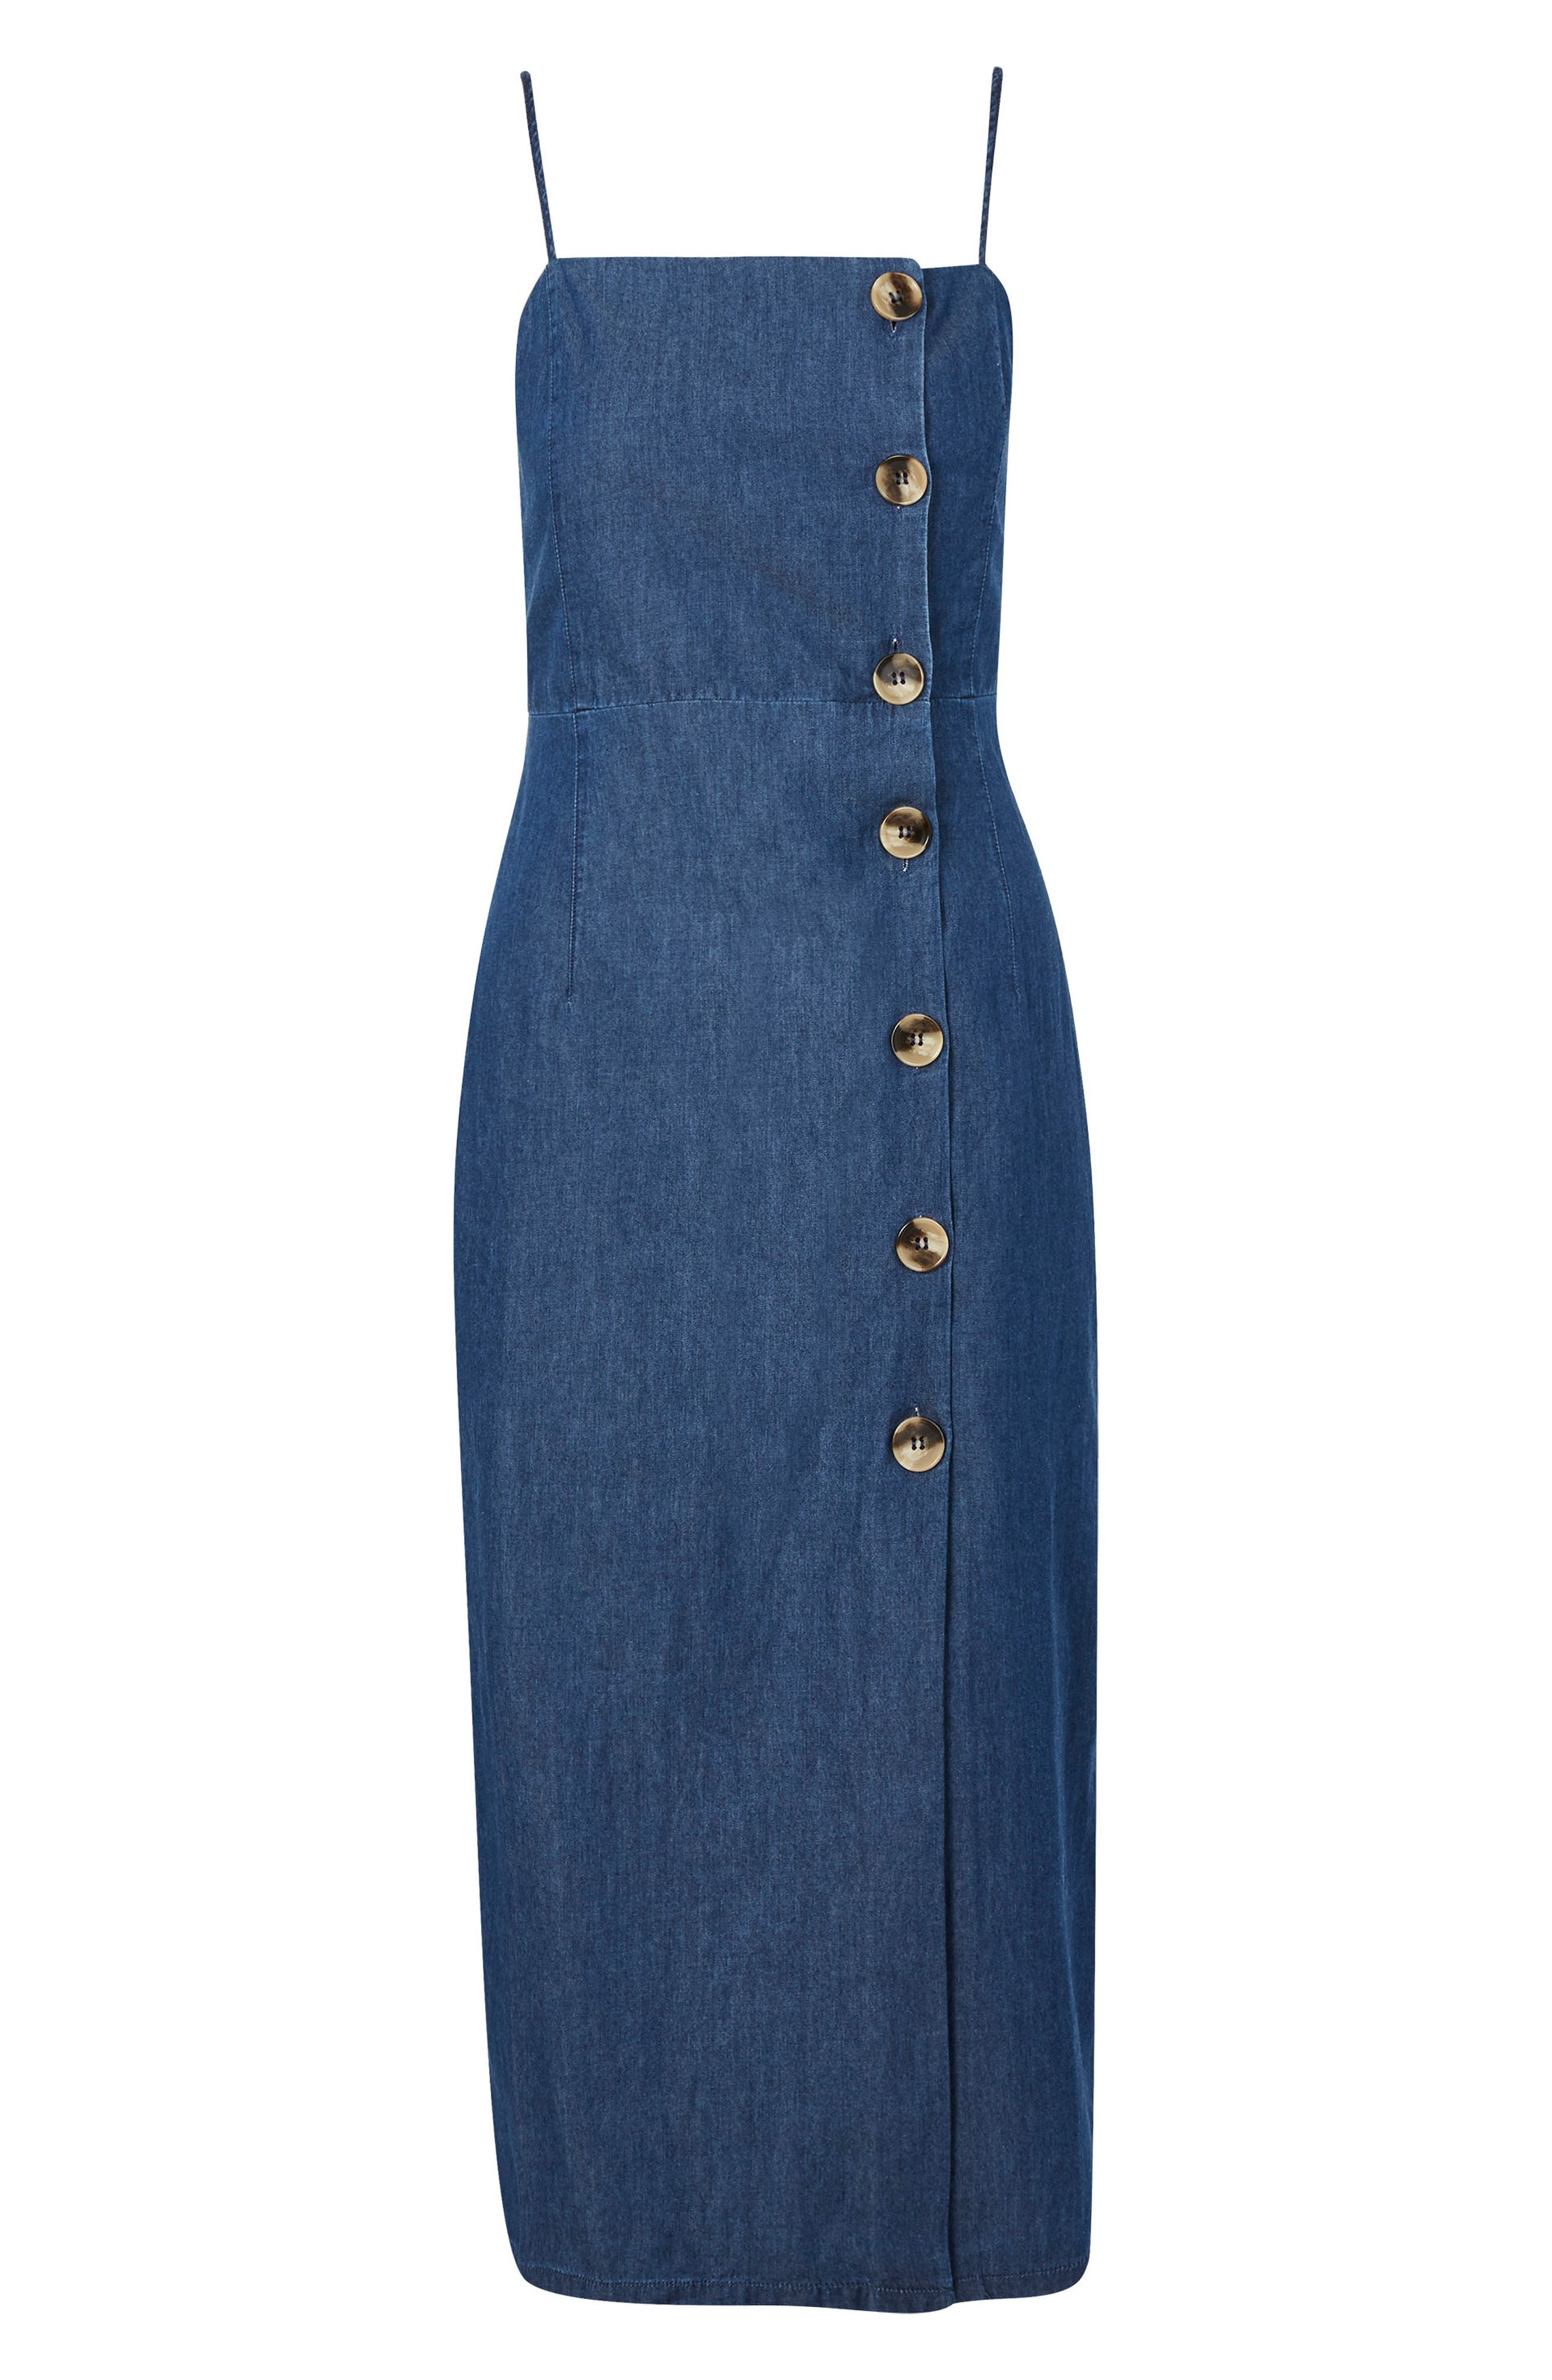 Horn Button Midi Dress,                             Alternate thumbnail 5, color,                             Mid Denim